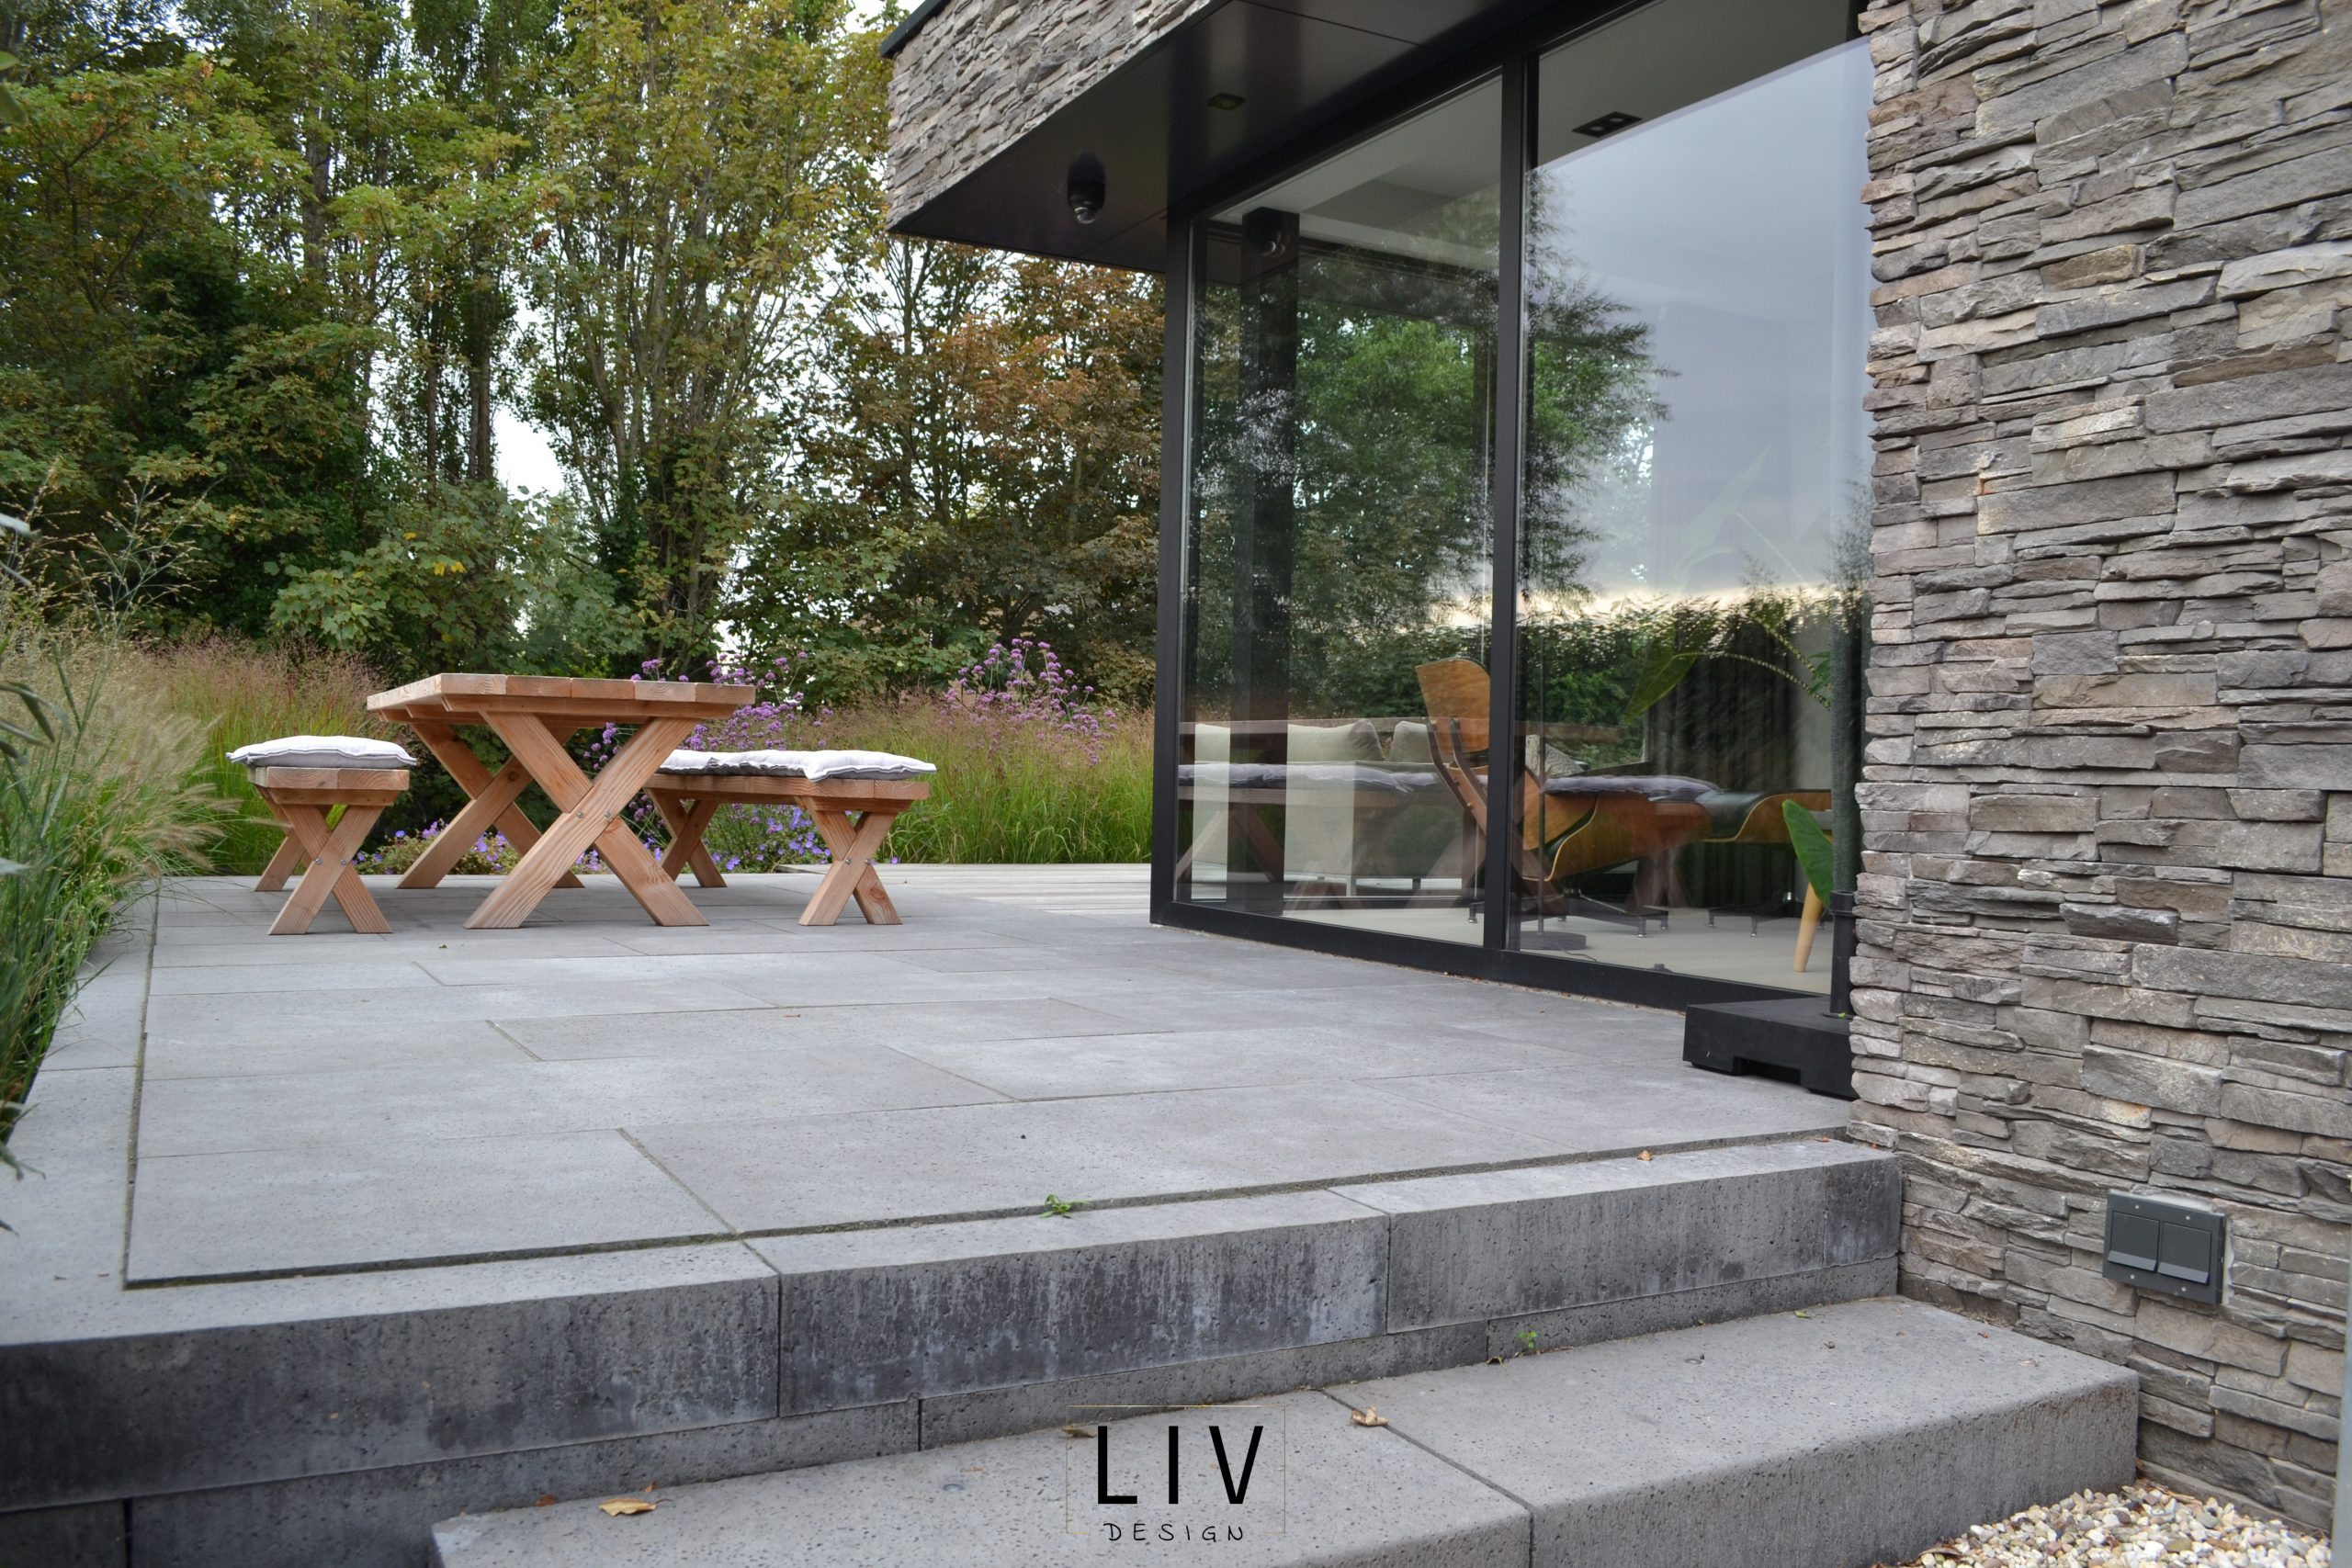 Tuinontwerp LIV design